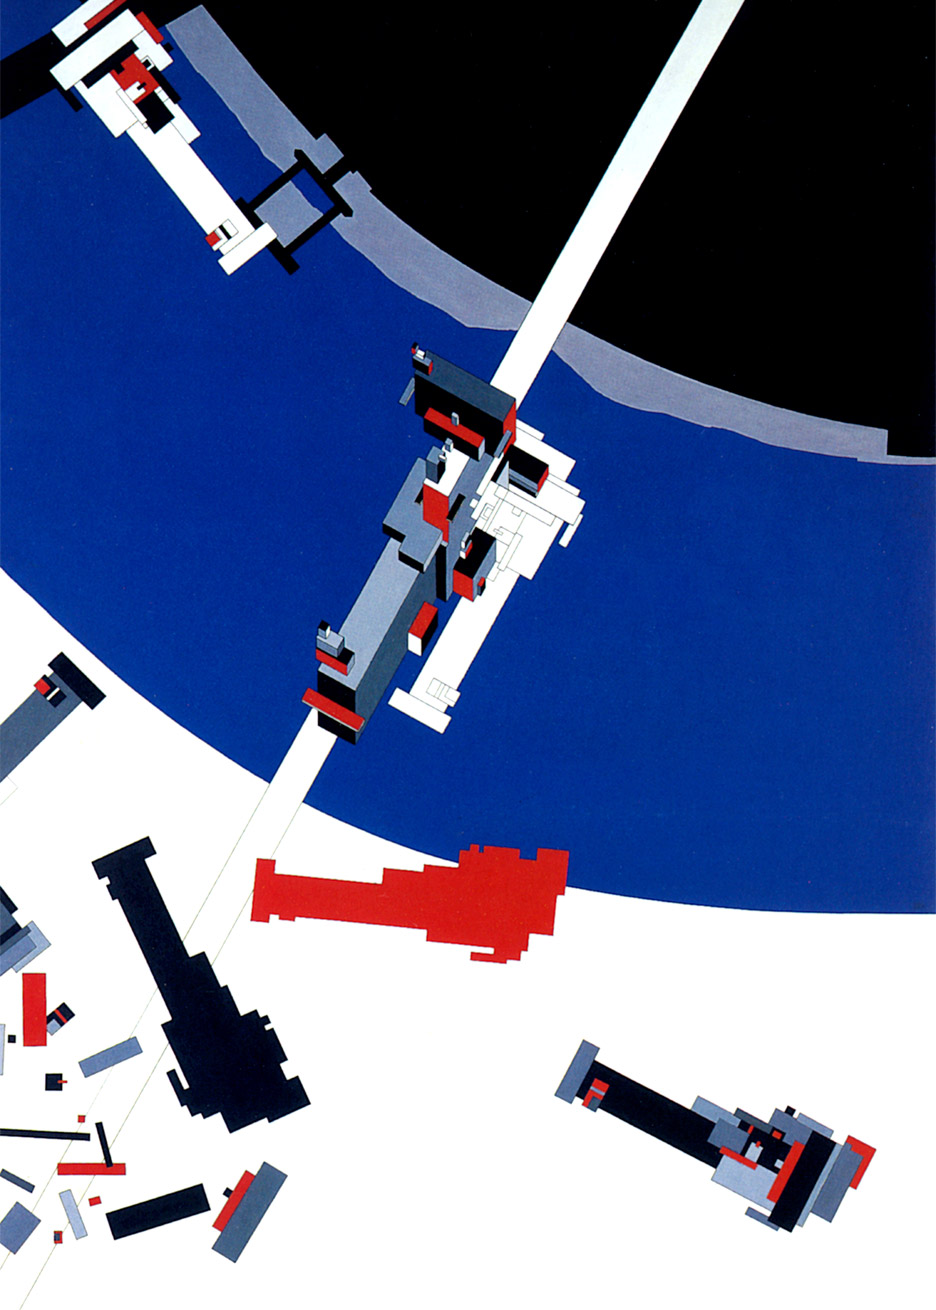 1976-1977-malevichs-tektonik-london-painting-zaha-hadid-architects-exhibition-palazzo-franchetti-venice-biennale-2016_dezeen_936_0